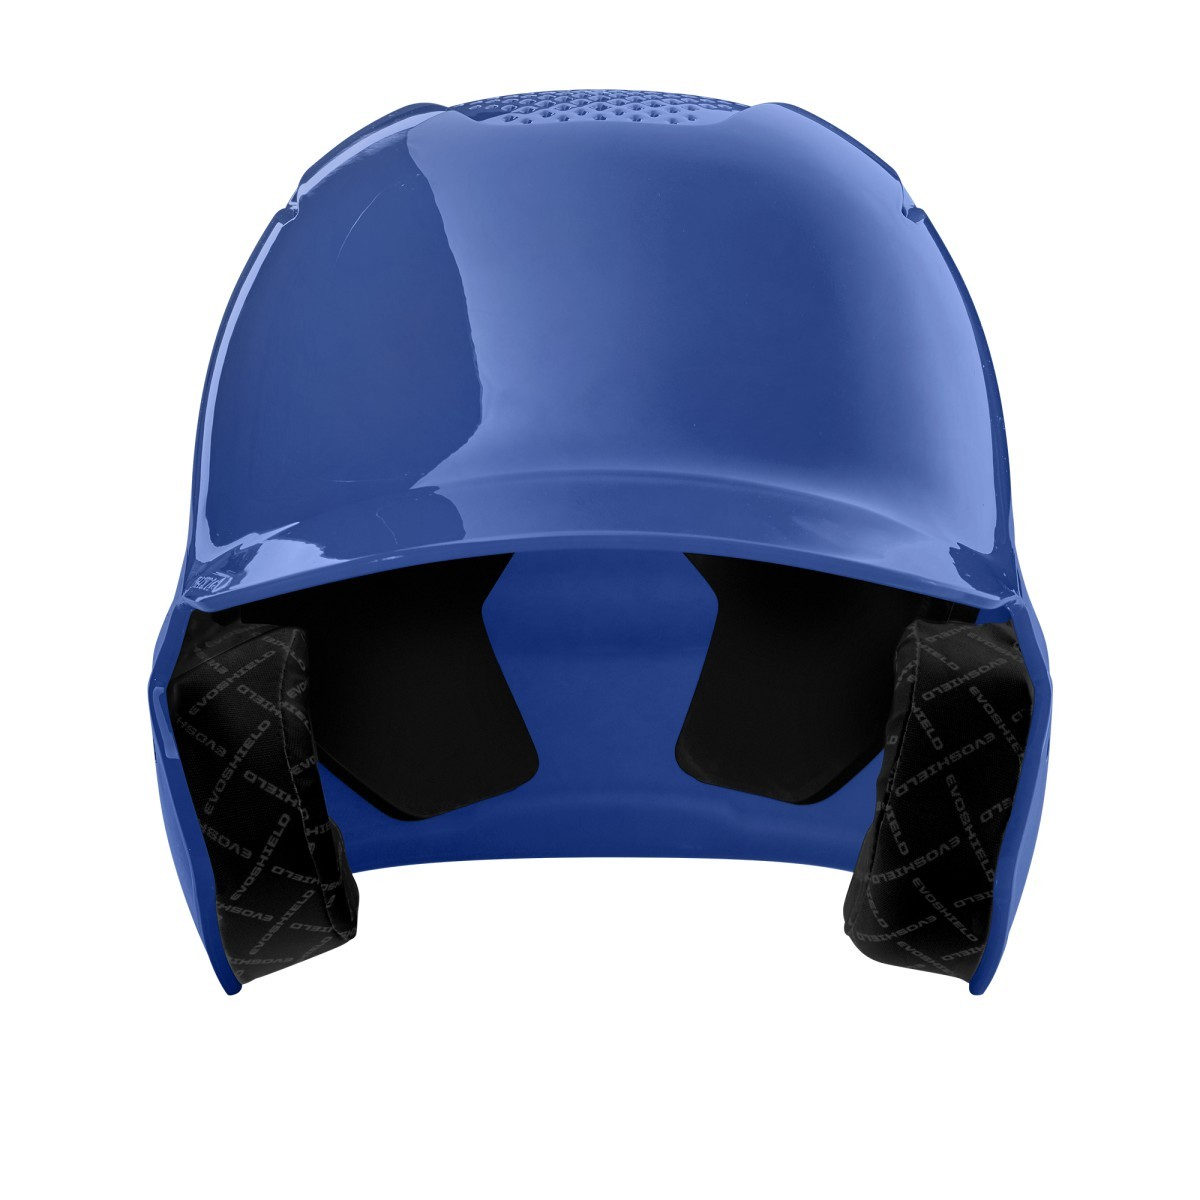 EVOSHIELD  XVT BATTING HELMET HIGH GLOSS FINISH - ROYAL BLUE